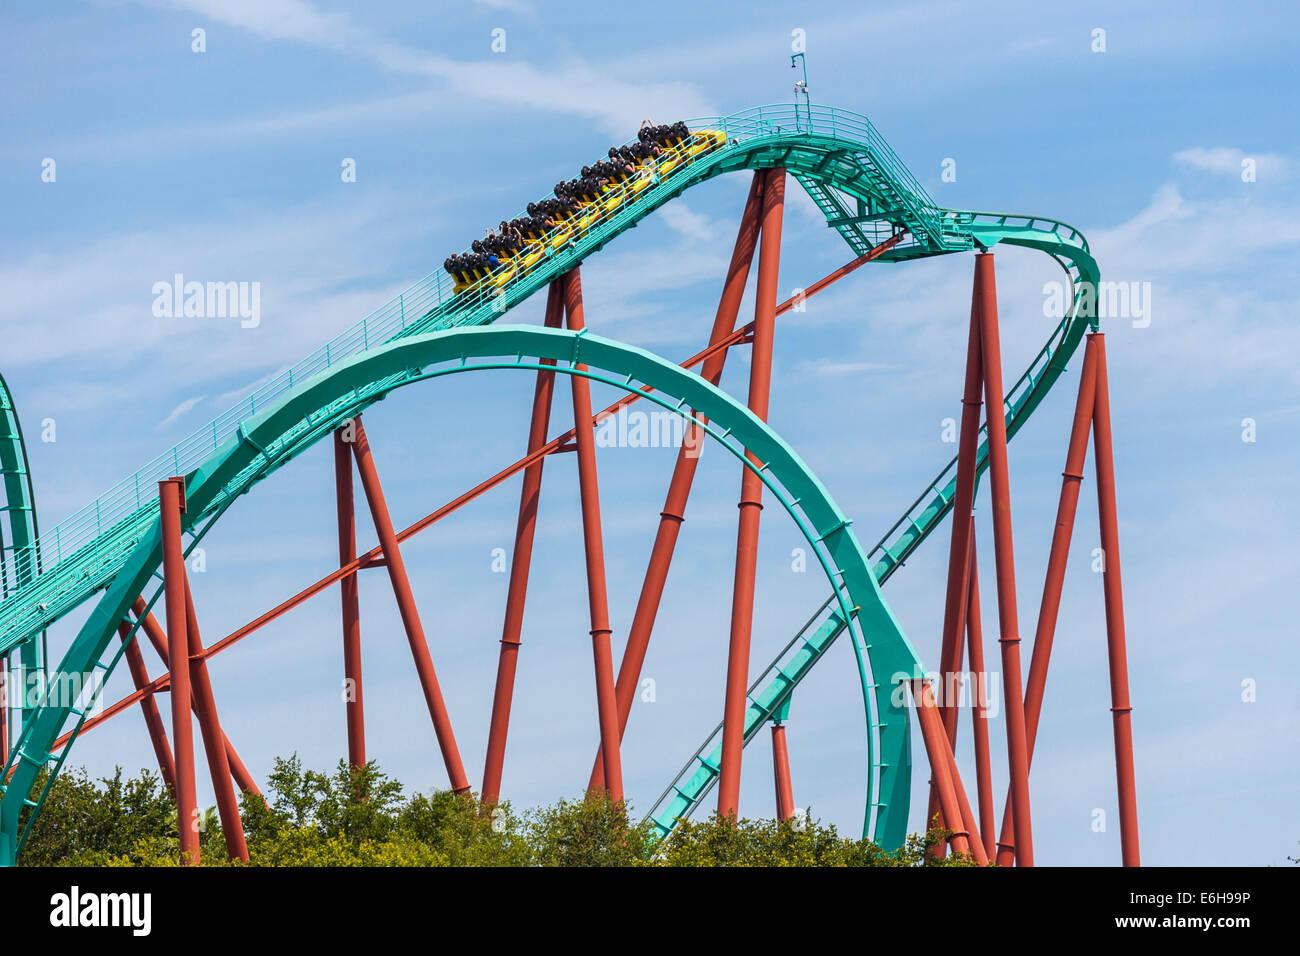 Kumba Roller Coaster At Busch Gardens Theme Park In Tampa Florida Stock Photo Royalty Free